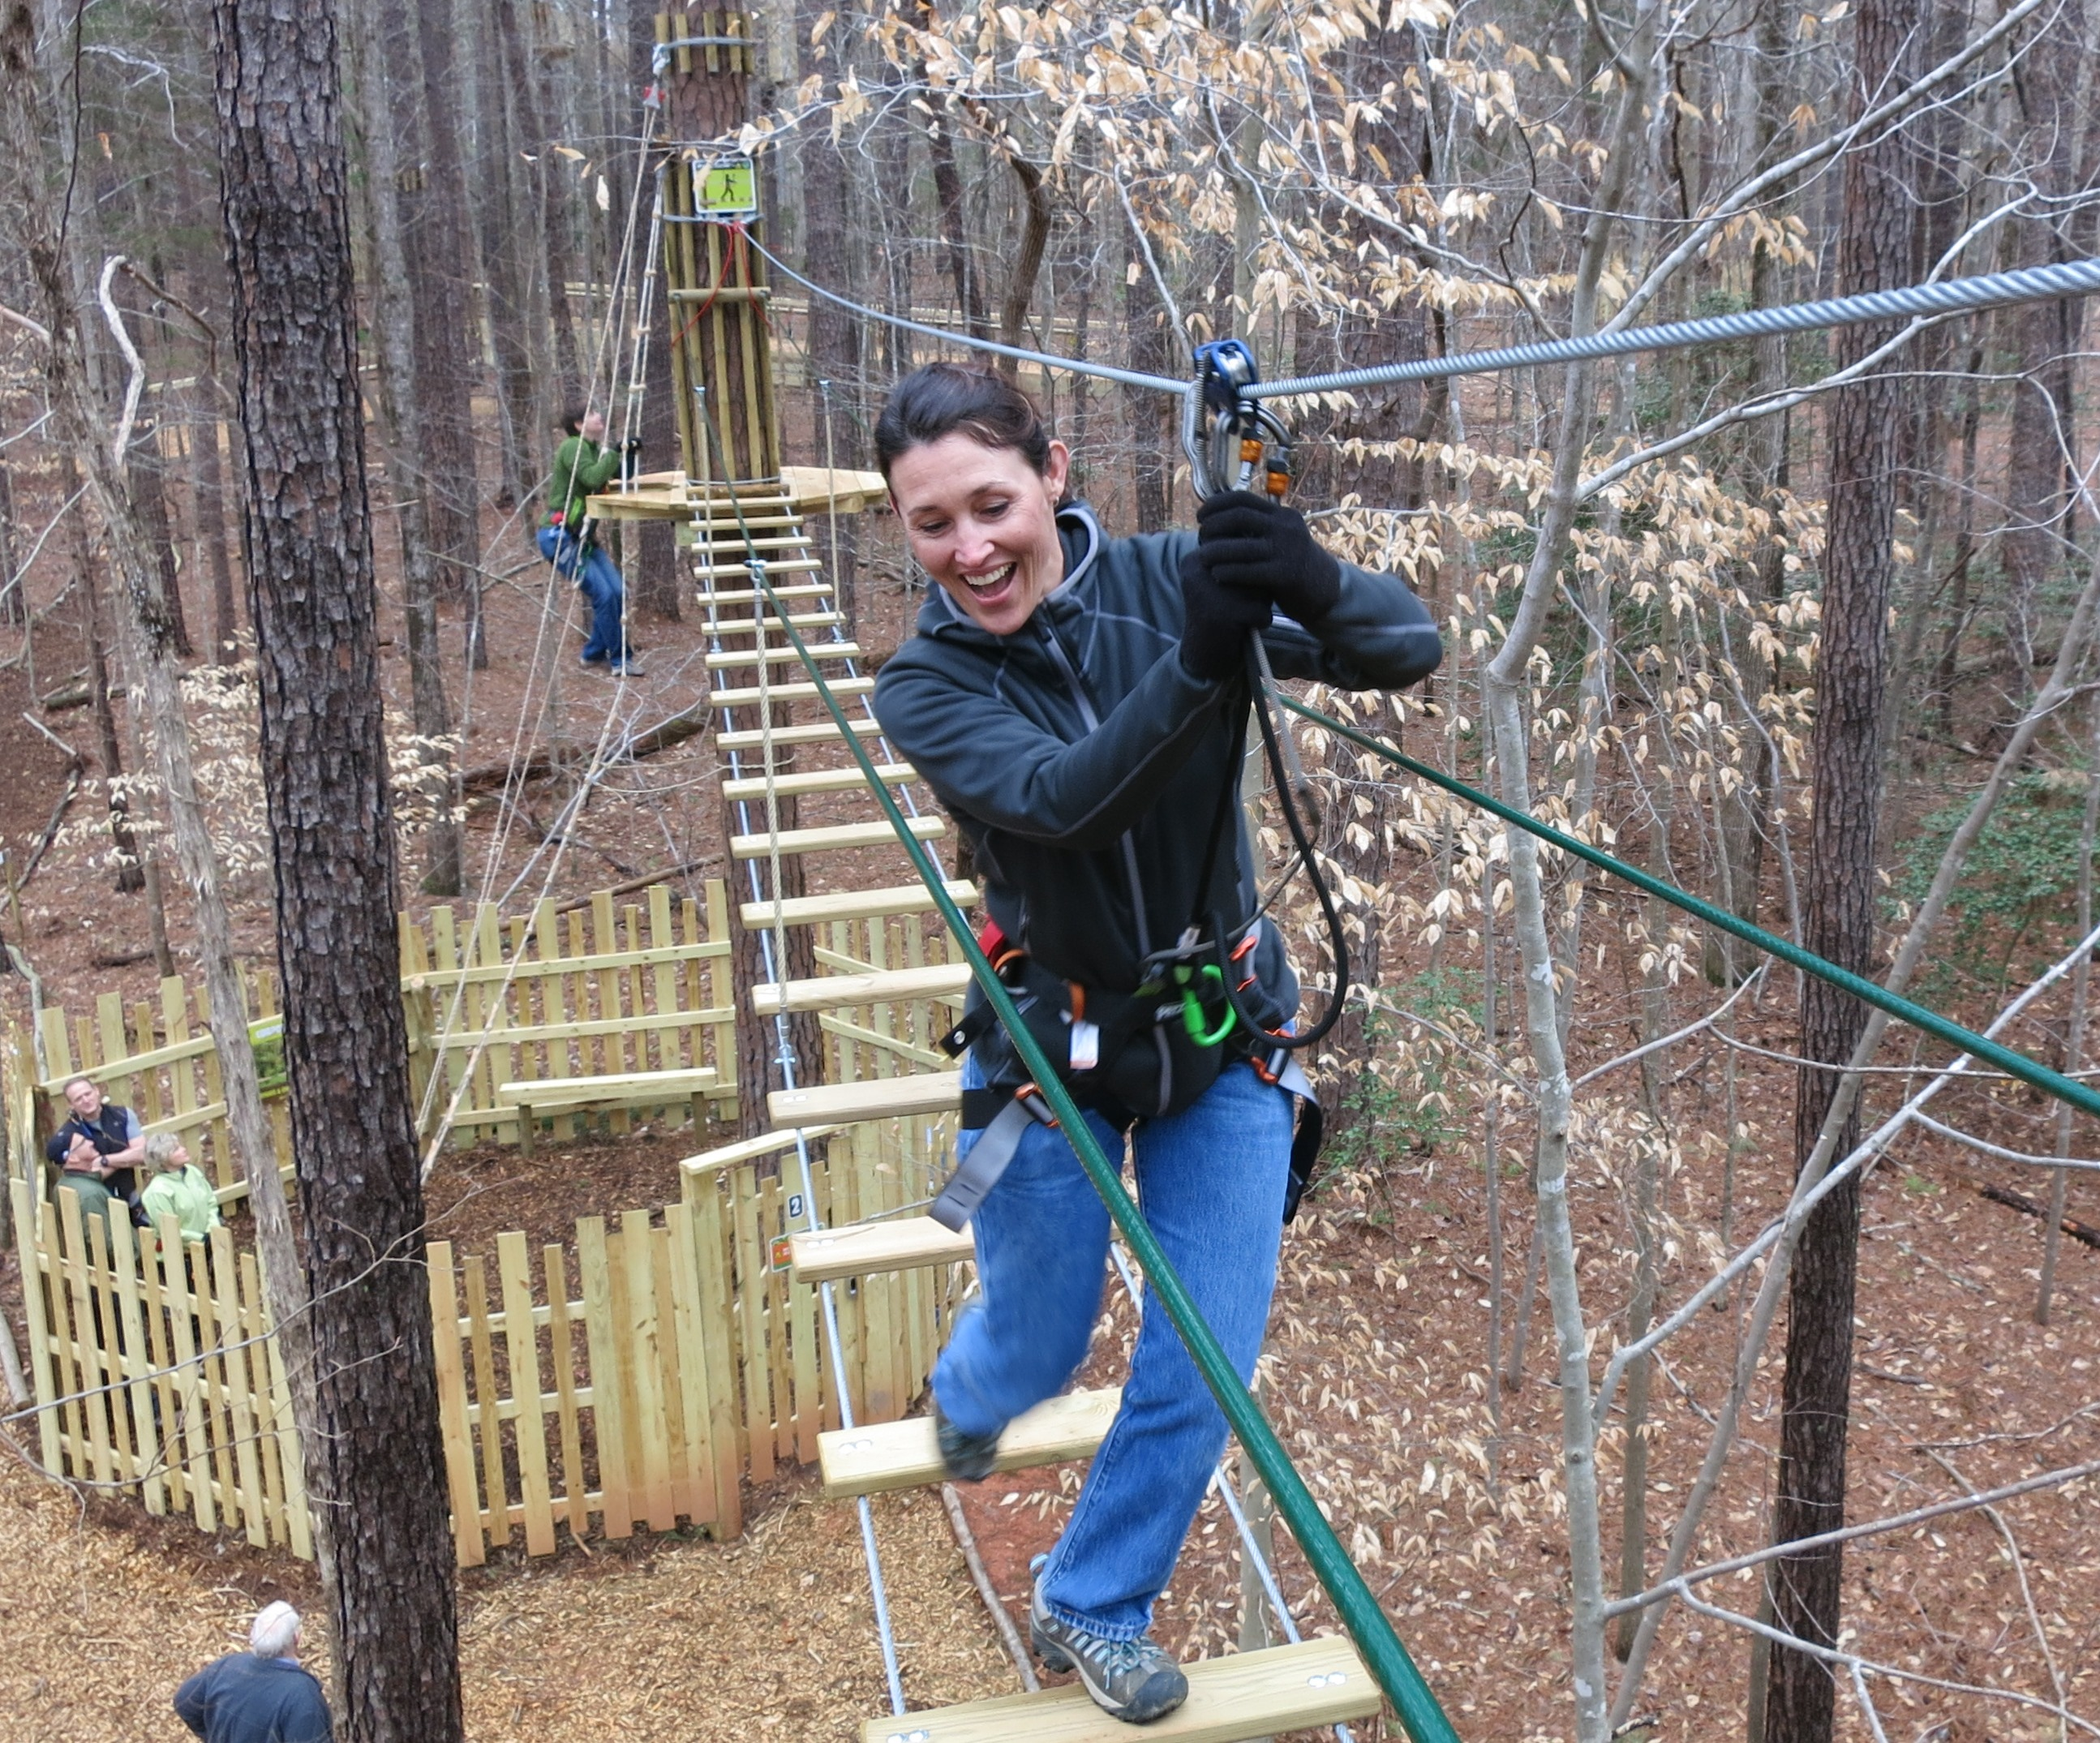 Go Ape Treetop Adventure Course | Courtesy of Blue Jay Point